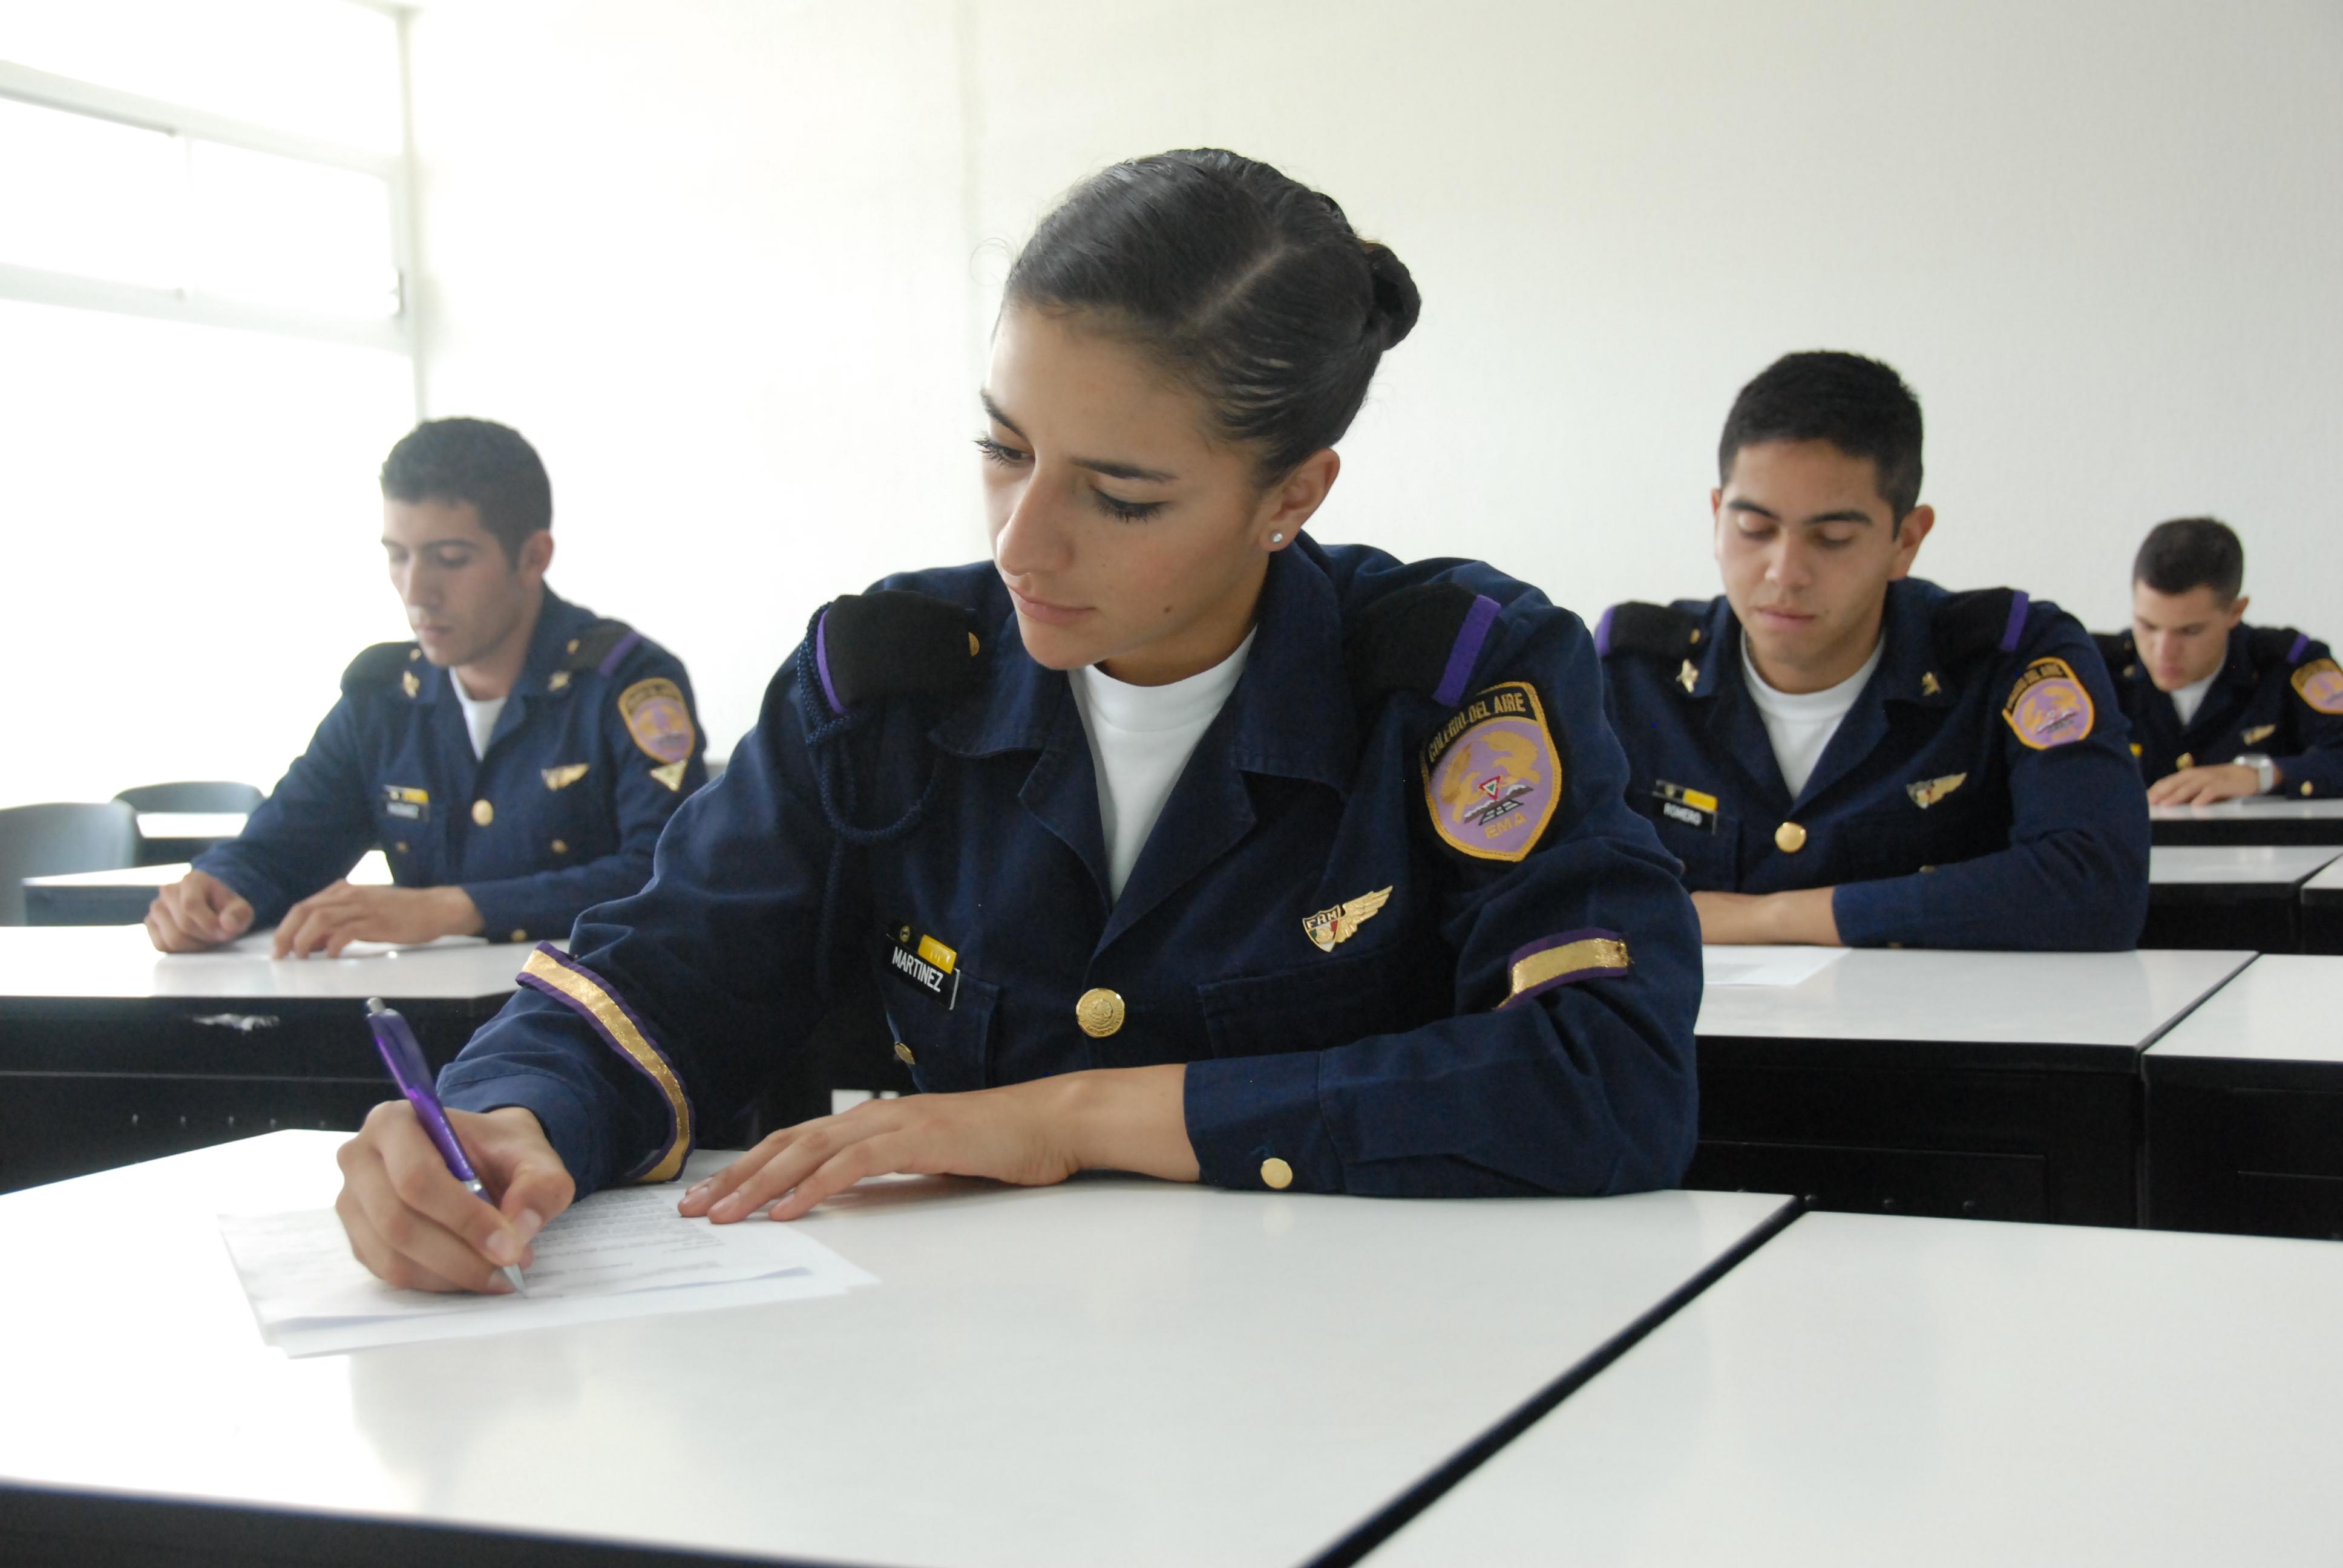 Documentación Necesaria. | Ingreso a Planteles Militares | Gobierno ...